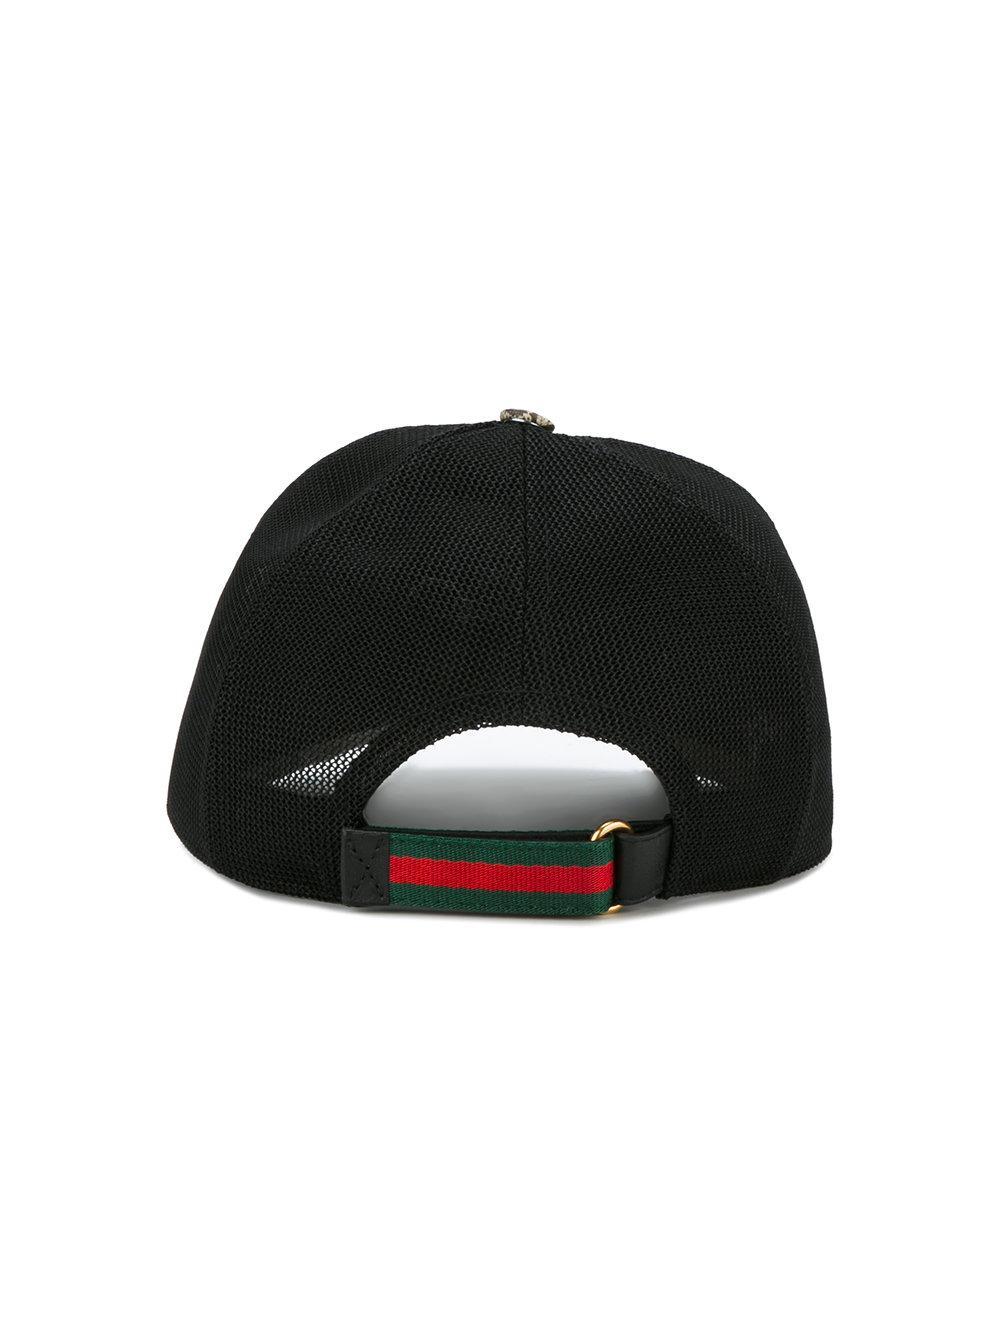 bdbbe3d69efdd Gucci Bee Print Gg Supreme Baseball Cap for Men - Lyst